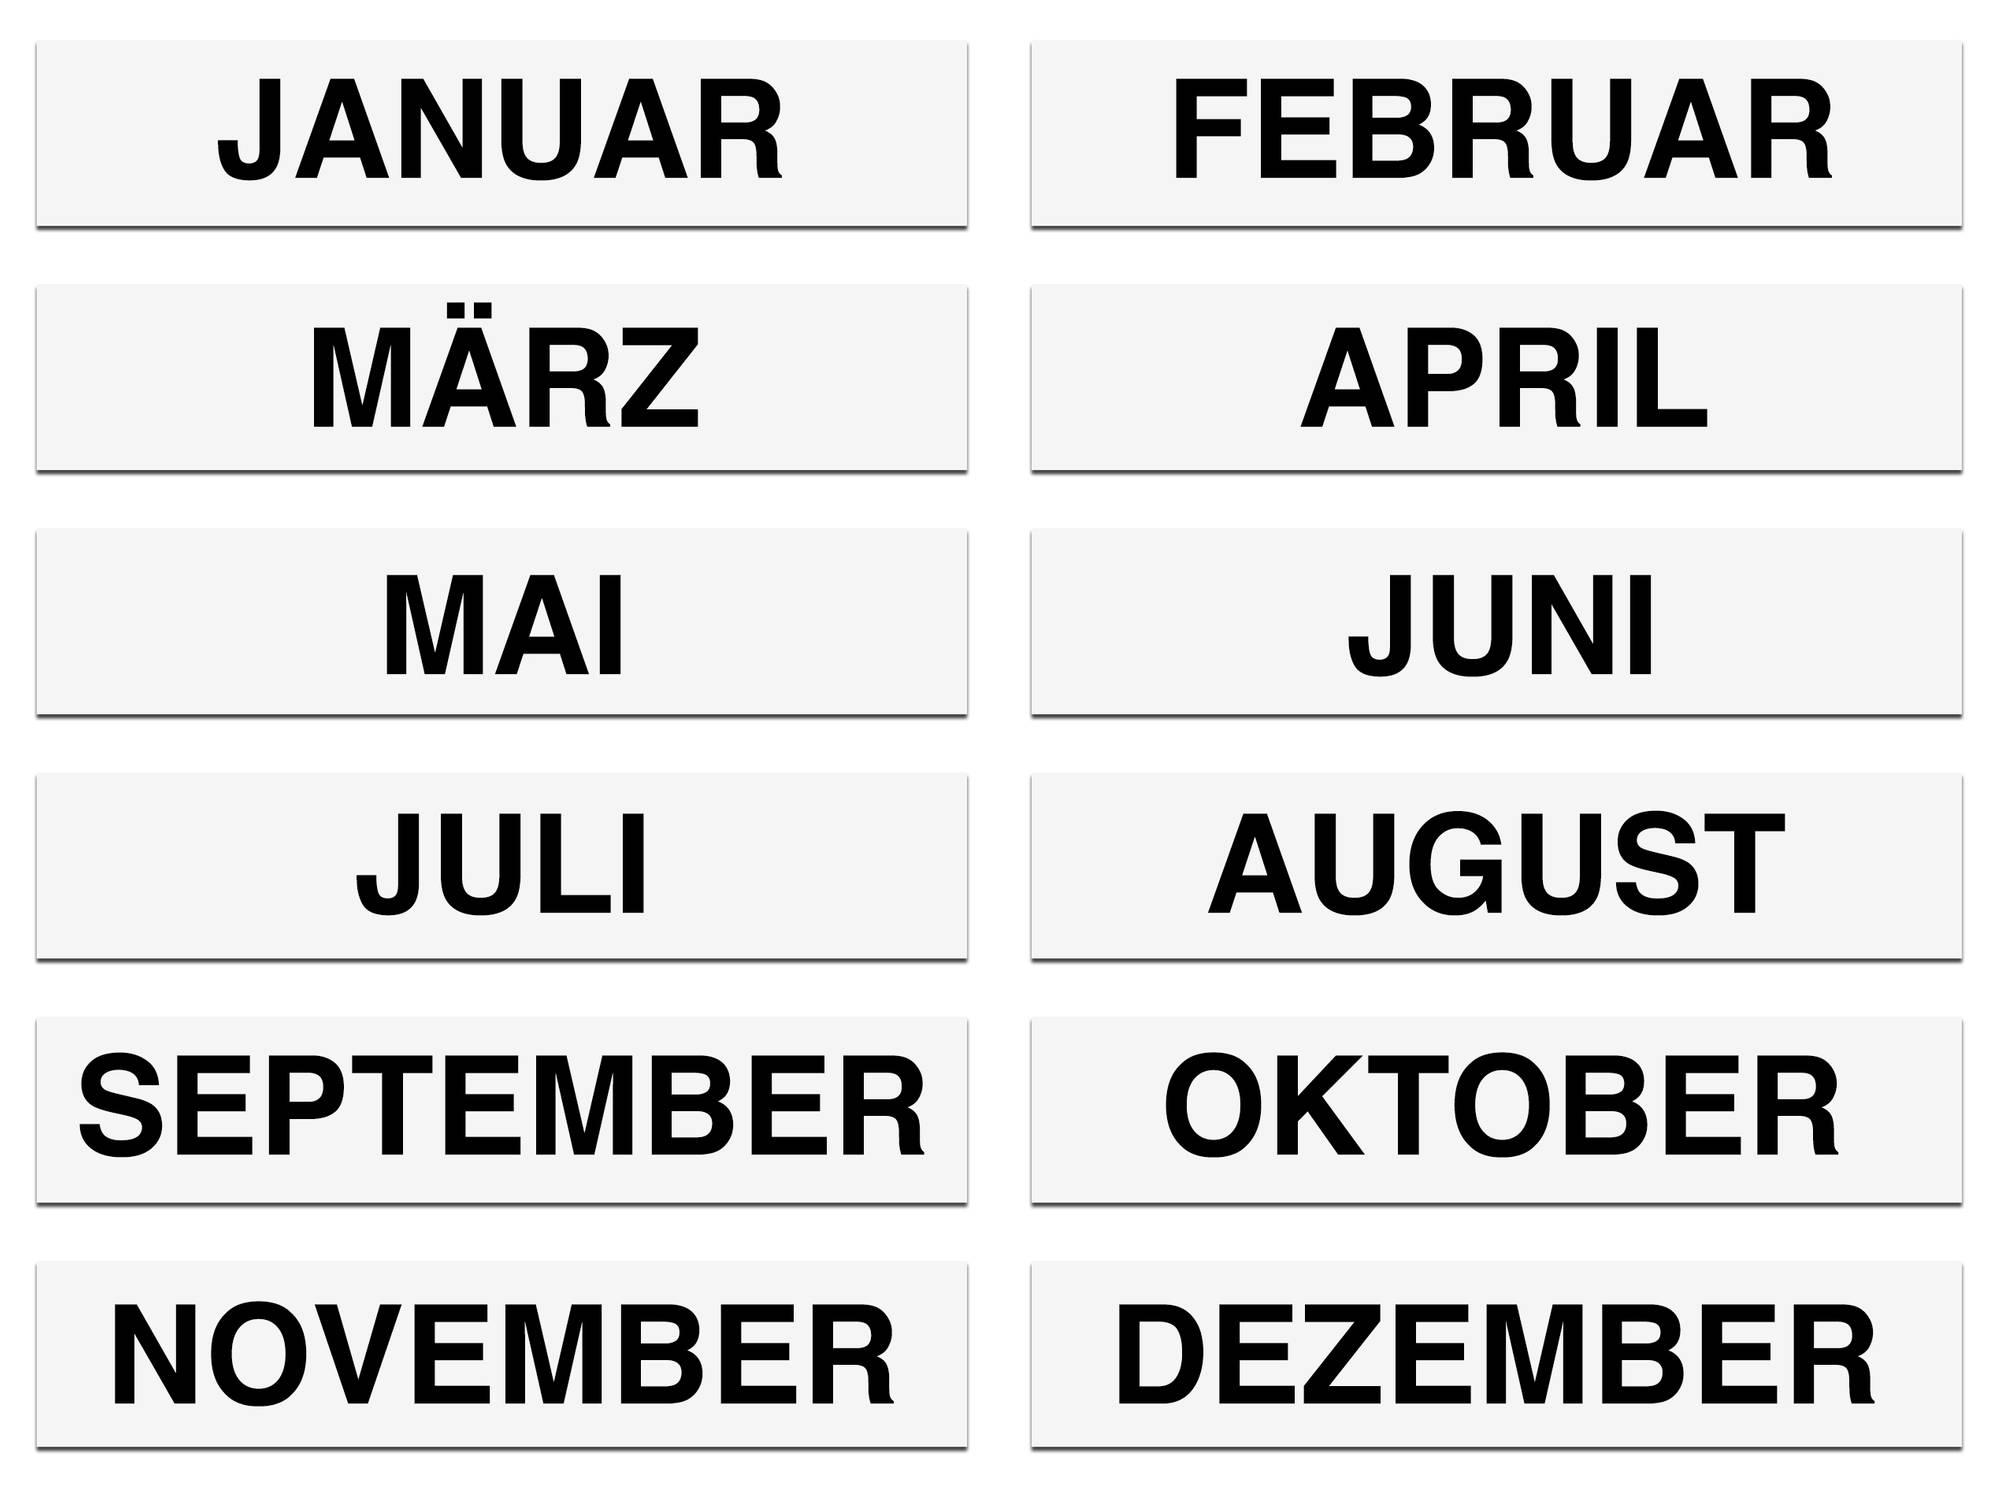 Schwarz bedruckte Monatsmagnete Januar bis Dezember mit den Maßen 100 x 20 mm